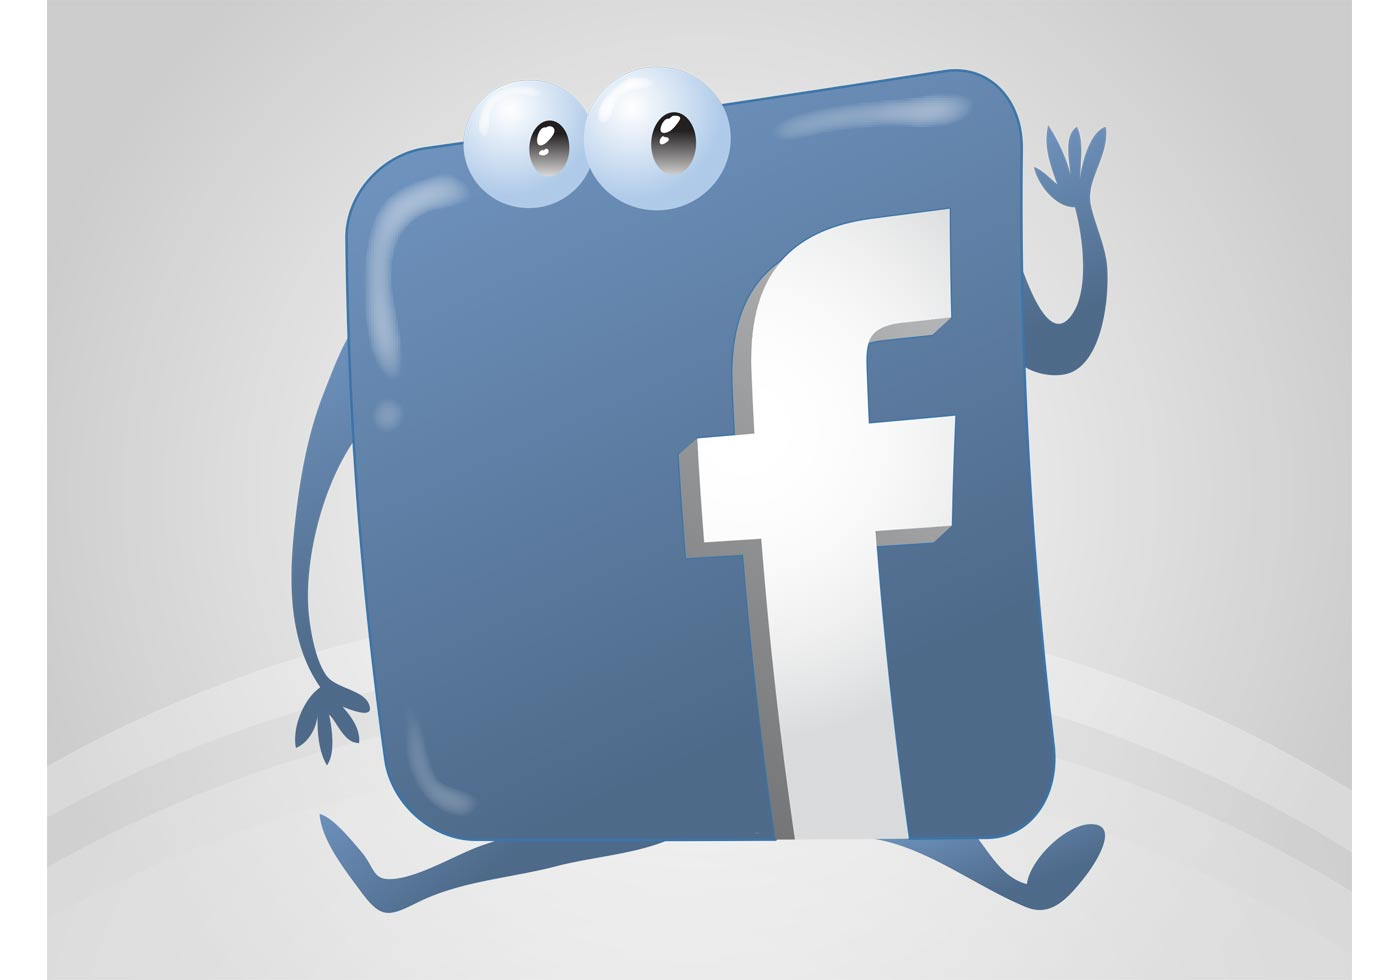 1400x980 Facebook Logo Cartoon